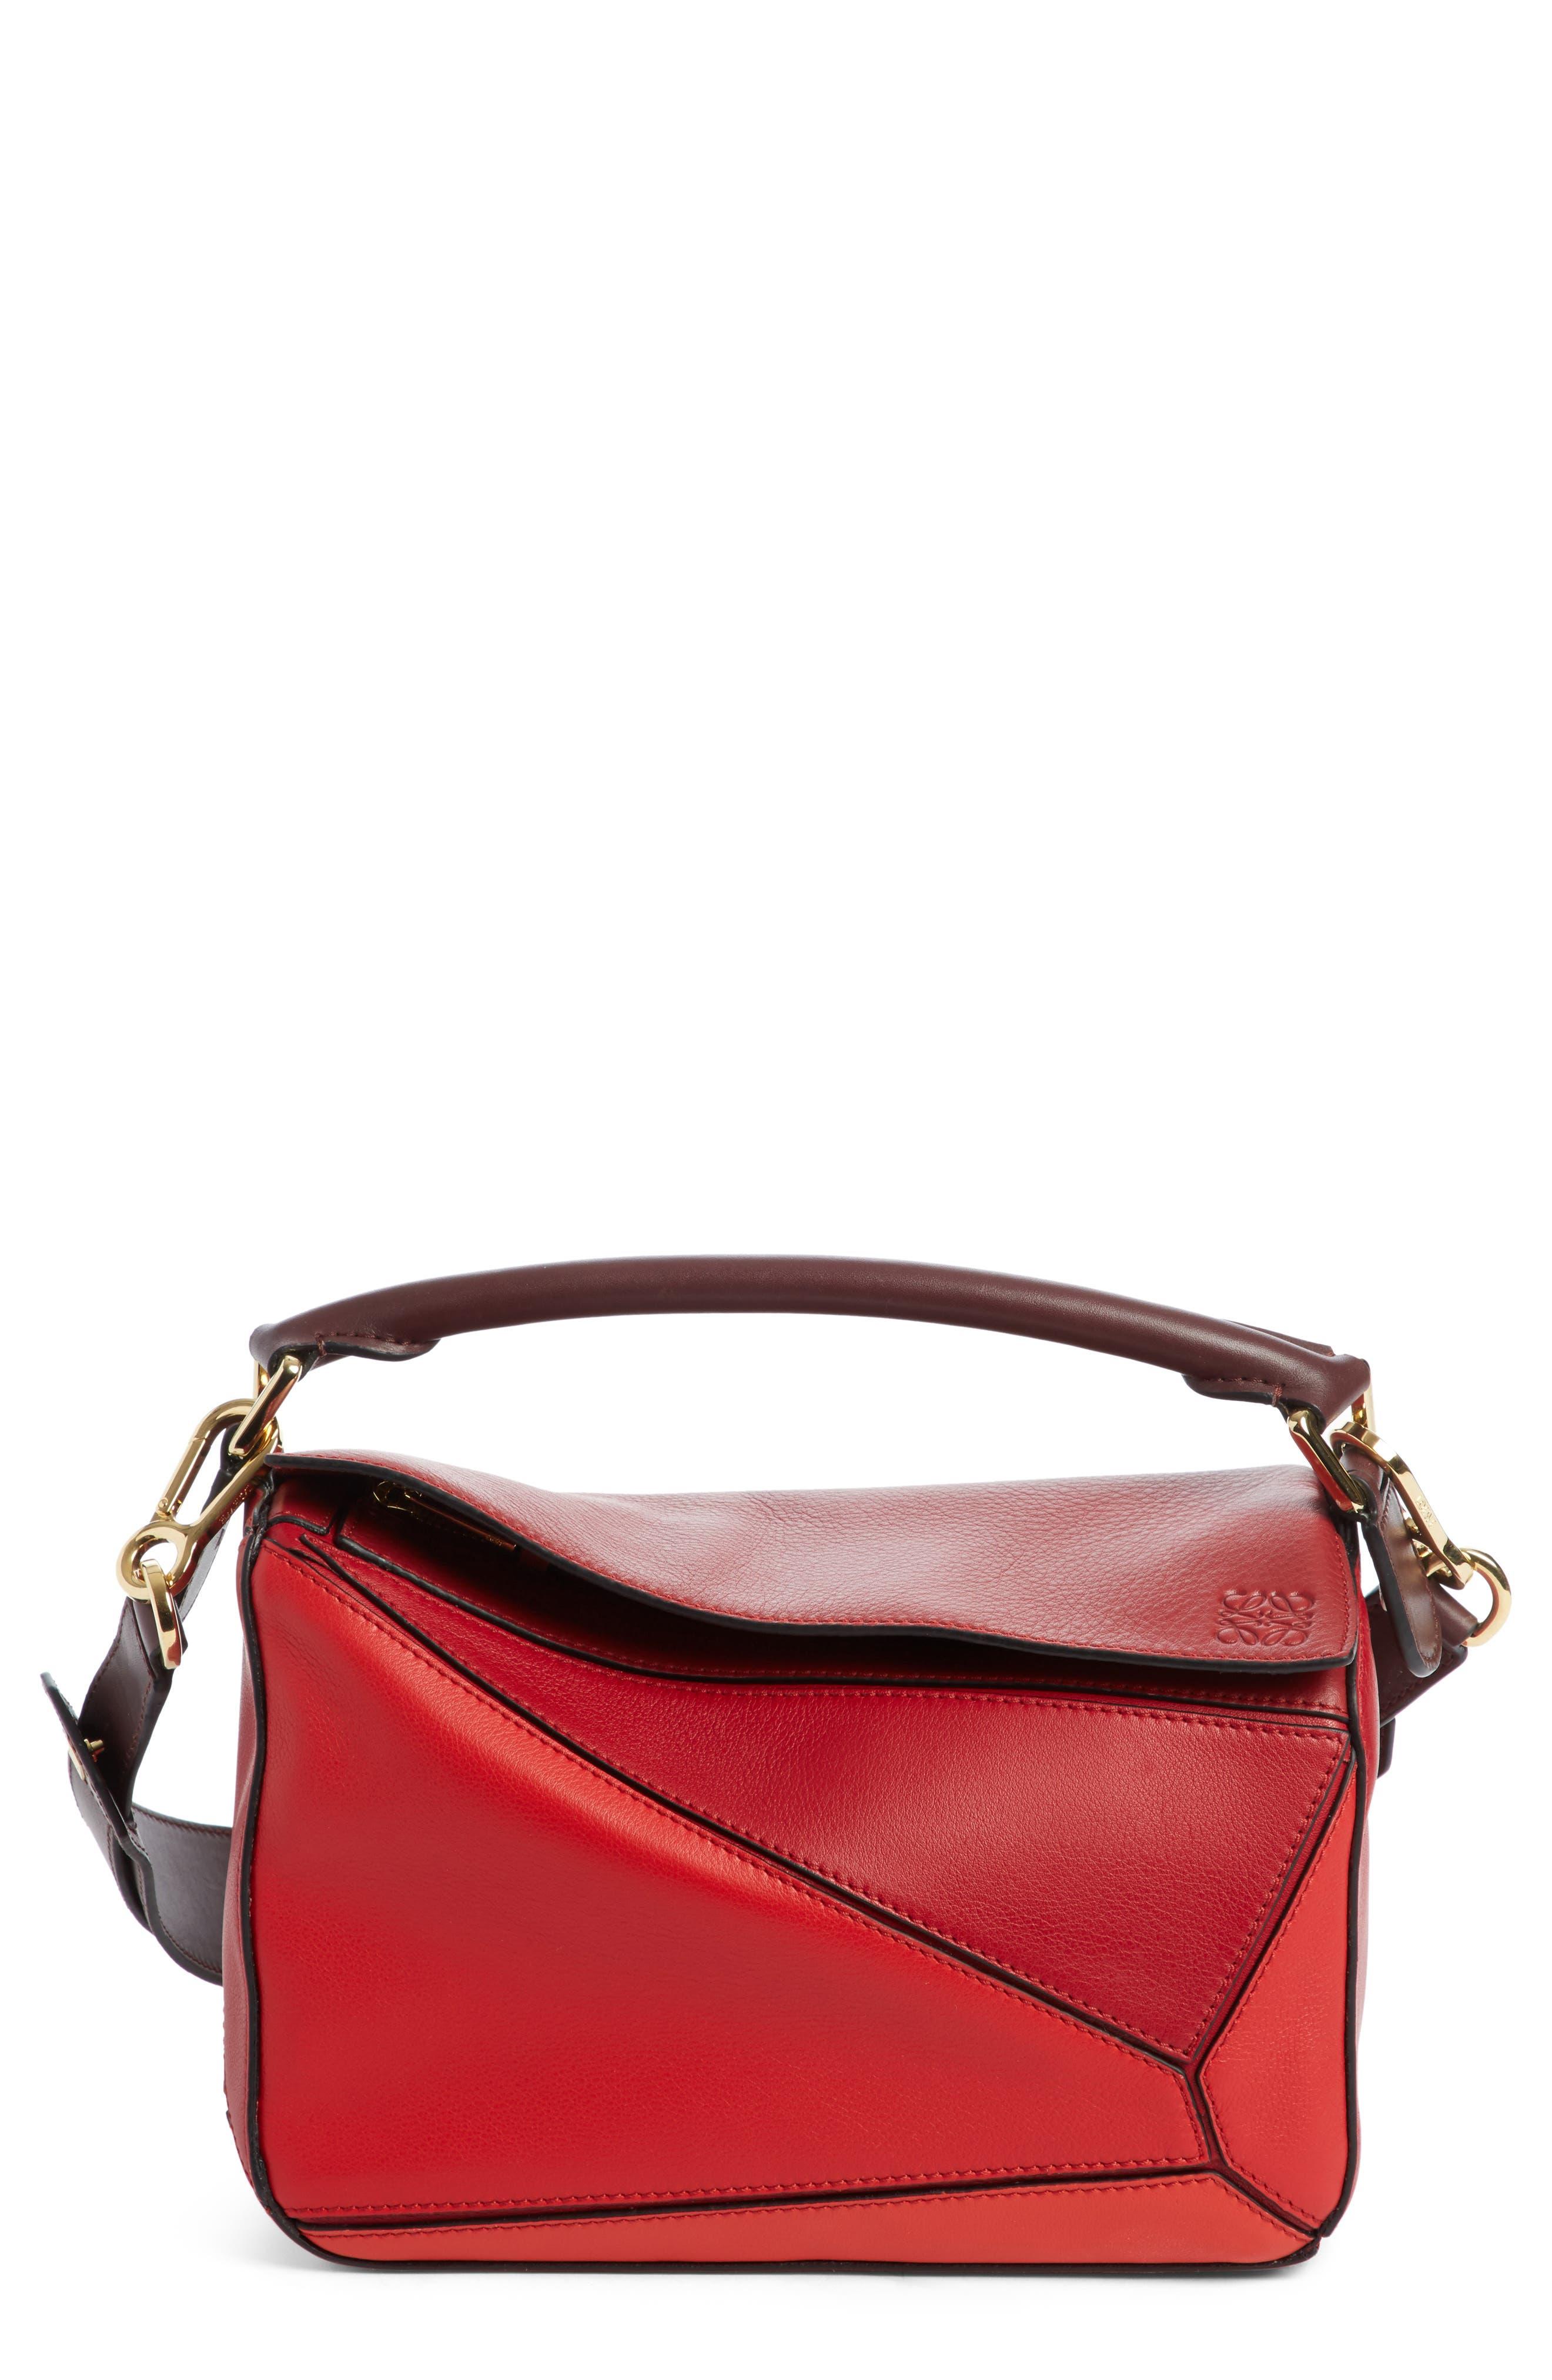 Loewe Small Colorblock Puzzle Bag